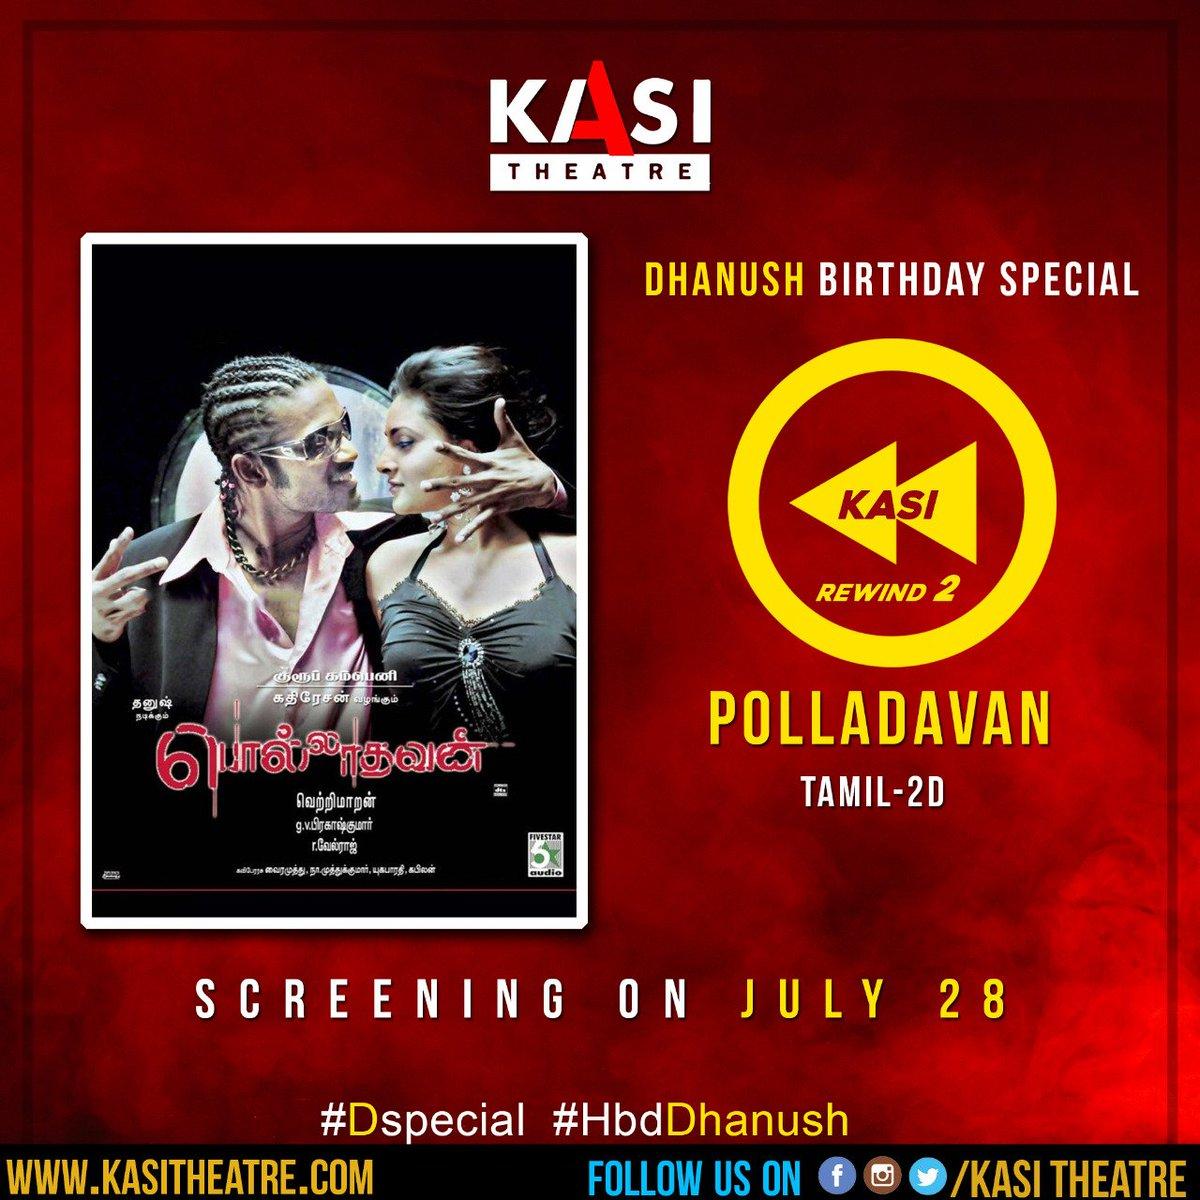 @dhanushkraja BIRTHDAY SPECIAL -  We are screening #Polladhavan on July 28 in our #KasiRewind. Grand celebrations planned !!   #Dspecial #HbdDhanush  #PolladhavanAtKASI #KasiTheatre  #Kasi4KDolbyAtmos